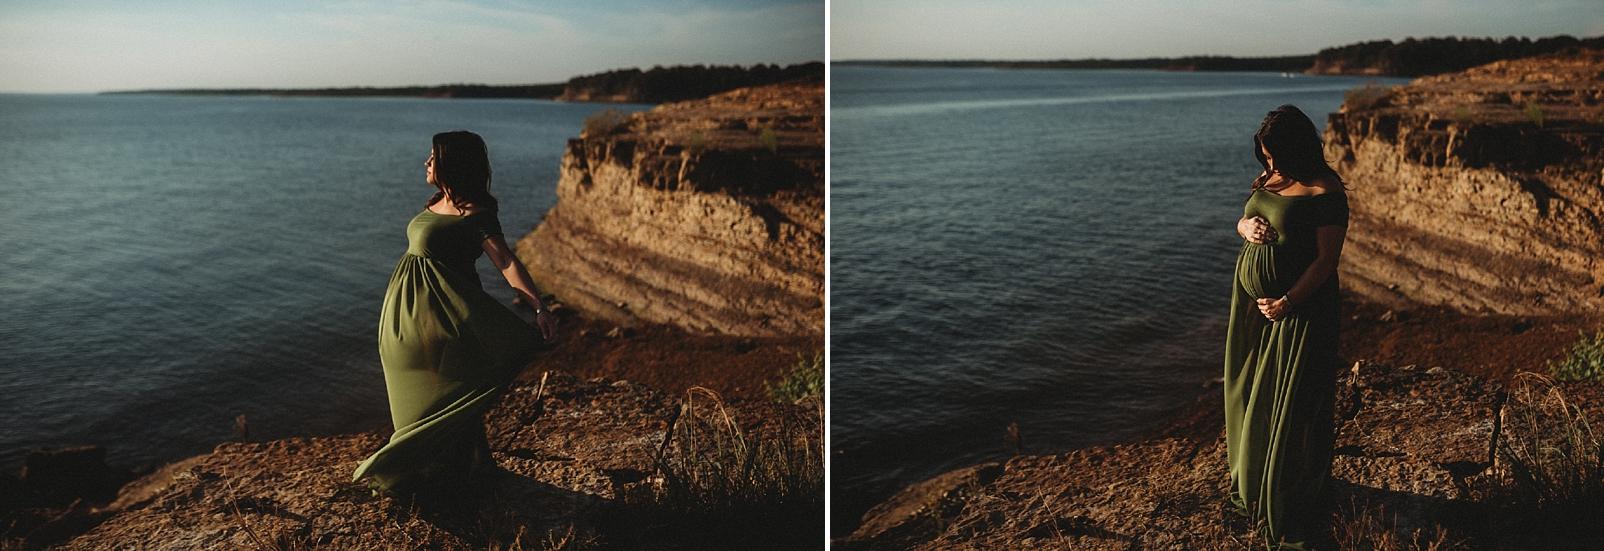 twyla jones photography - www.twylajones.com - sunset family maternity photoshoot dallas texas lake-TDJ_9135.jpg